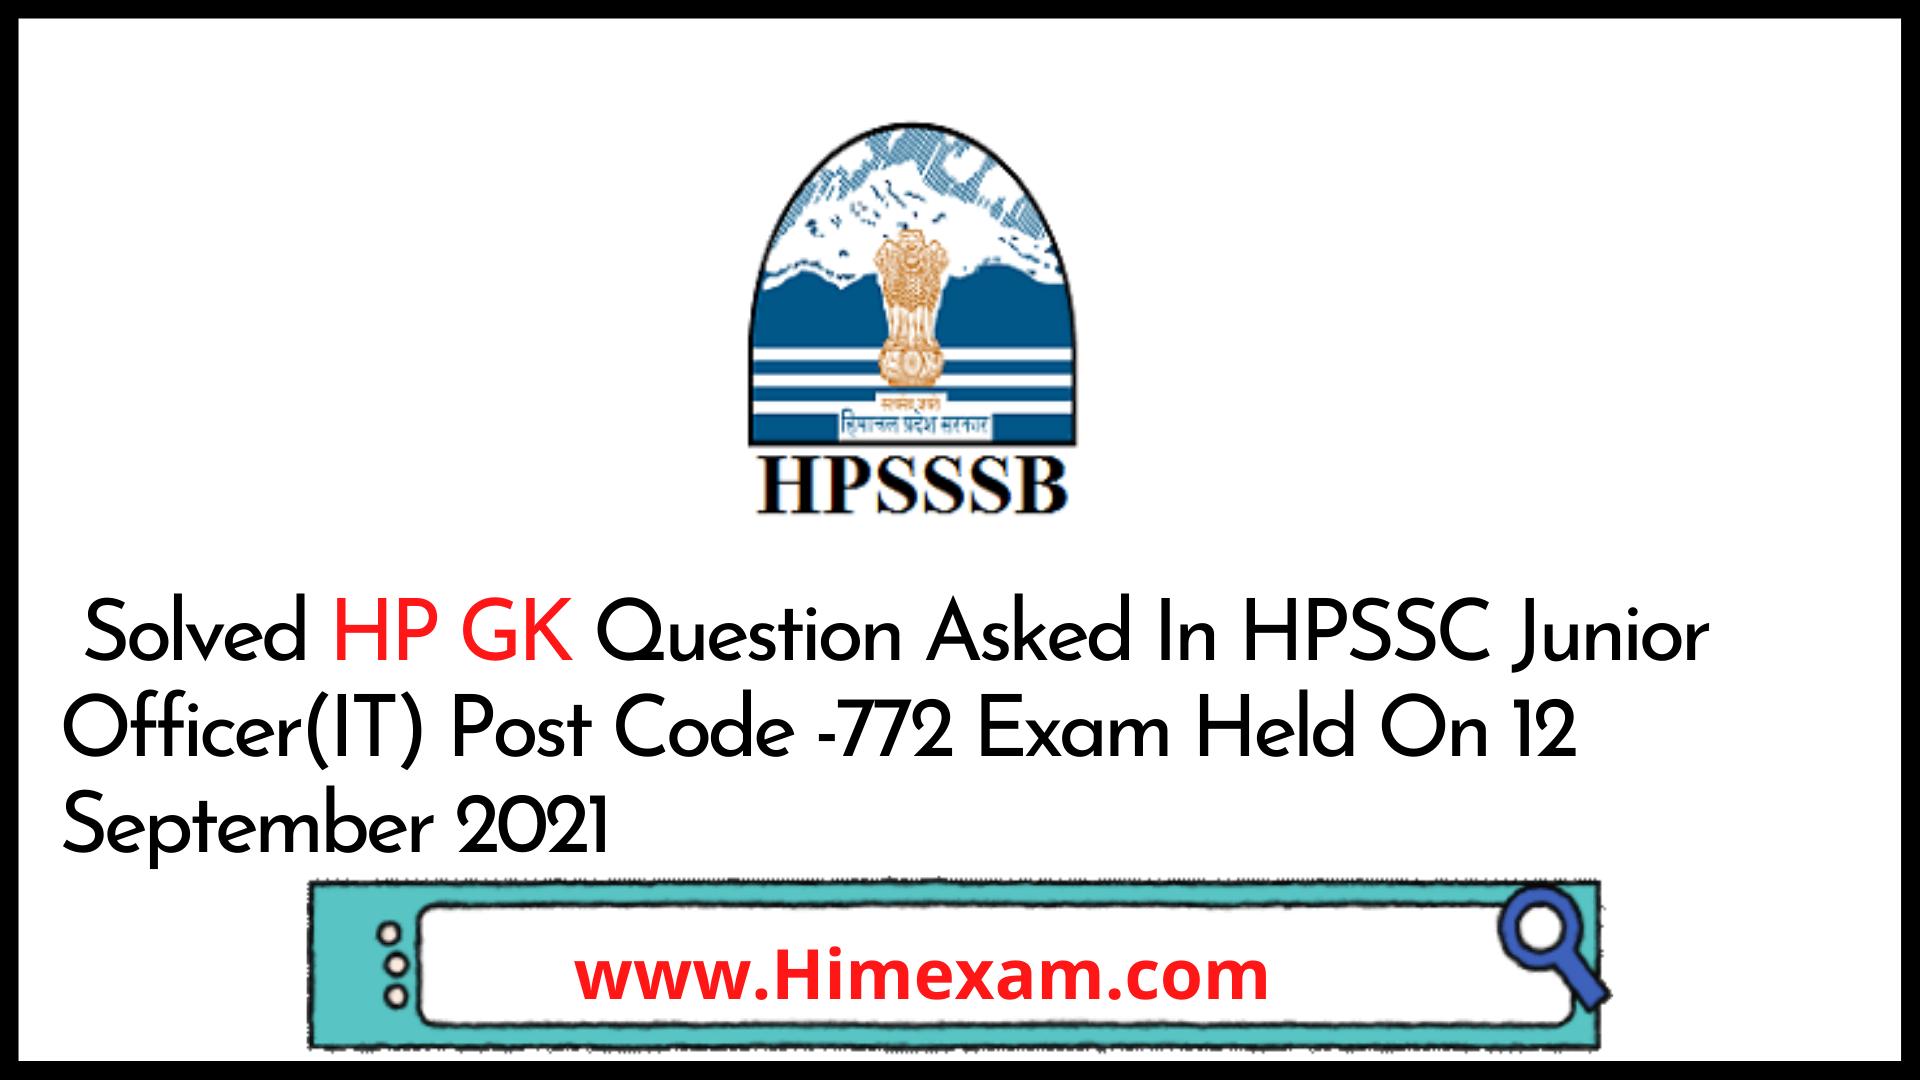 Solved HP GK Question Asked In HPSSC Junior Officer(IT) Post Code -772 Exam Held On 12 September 2021